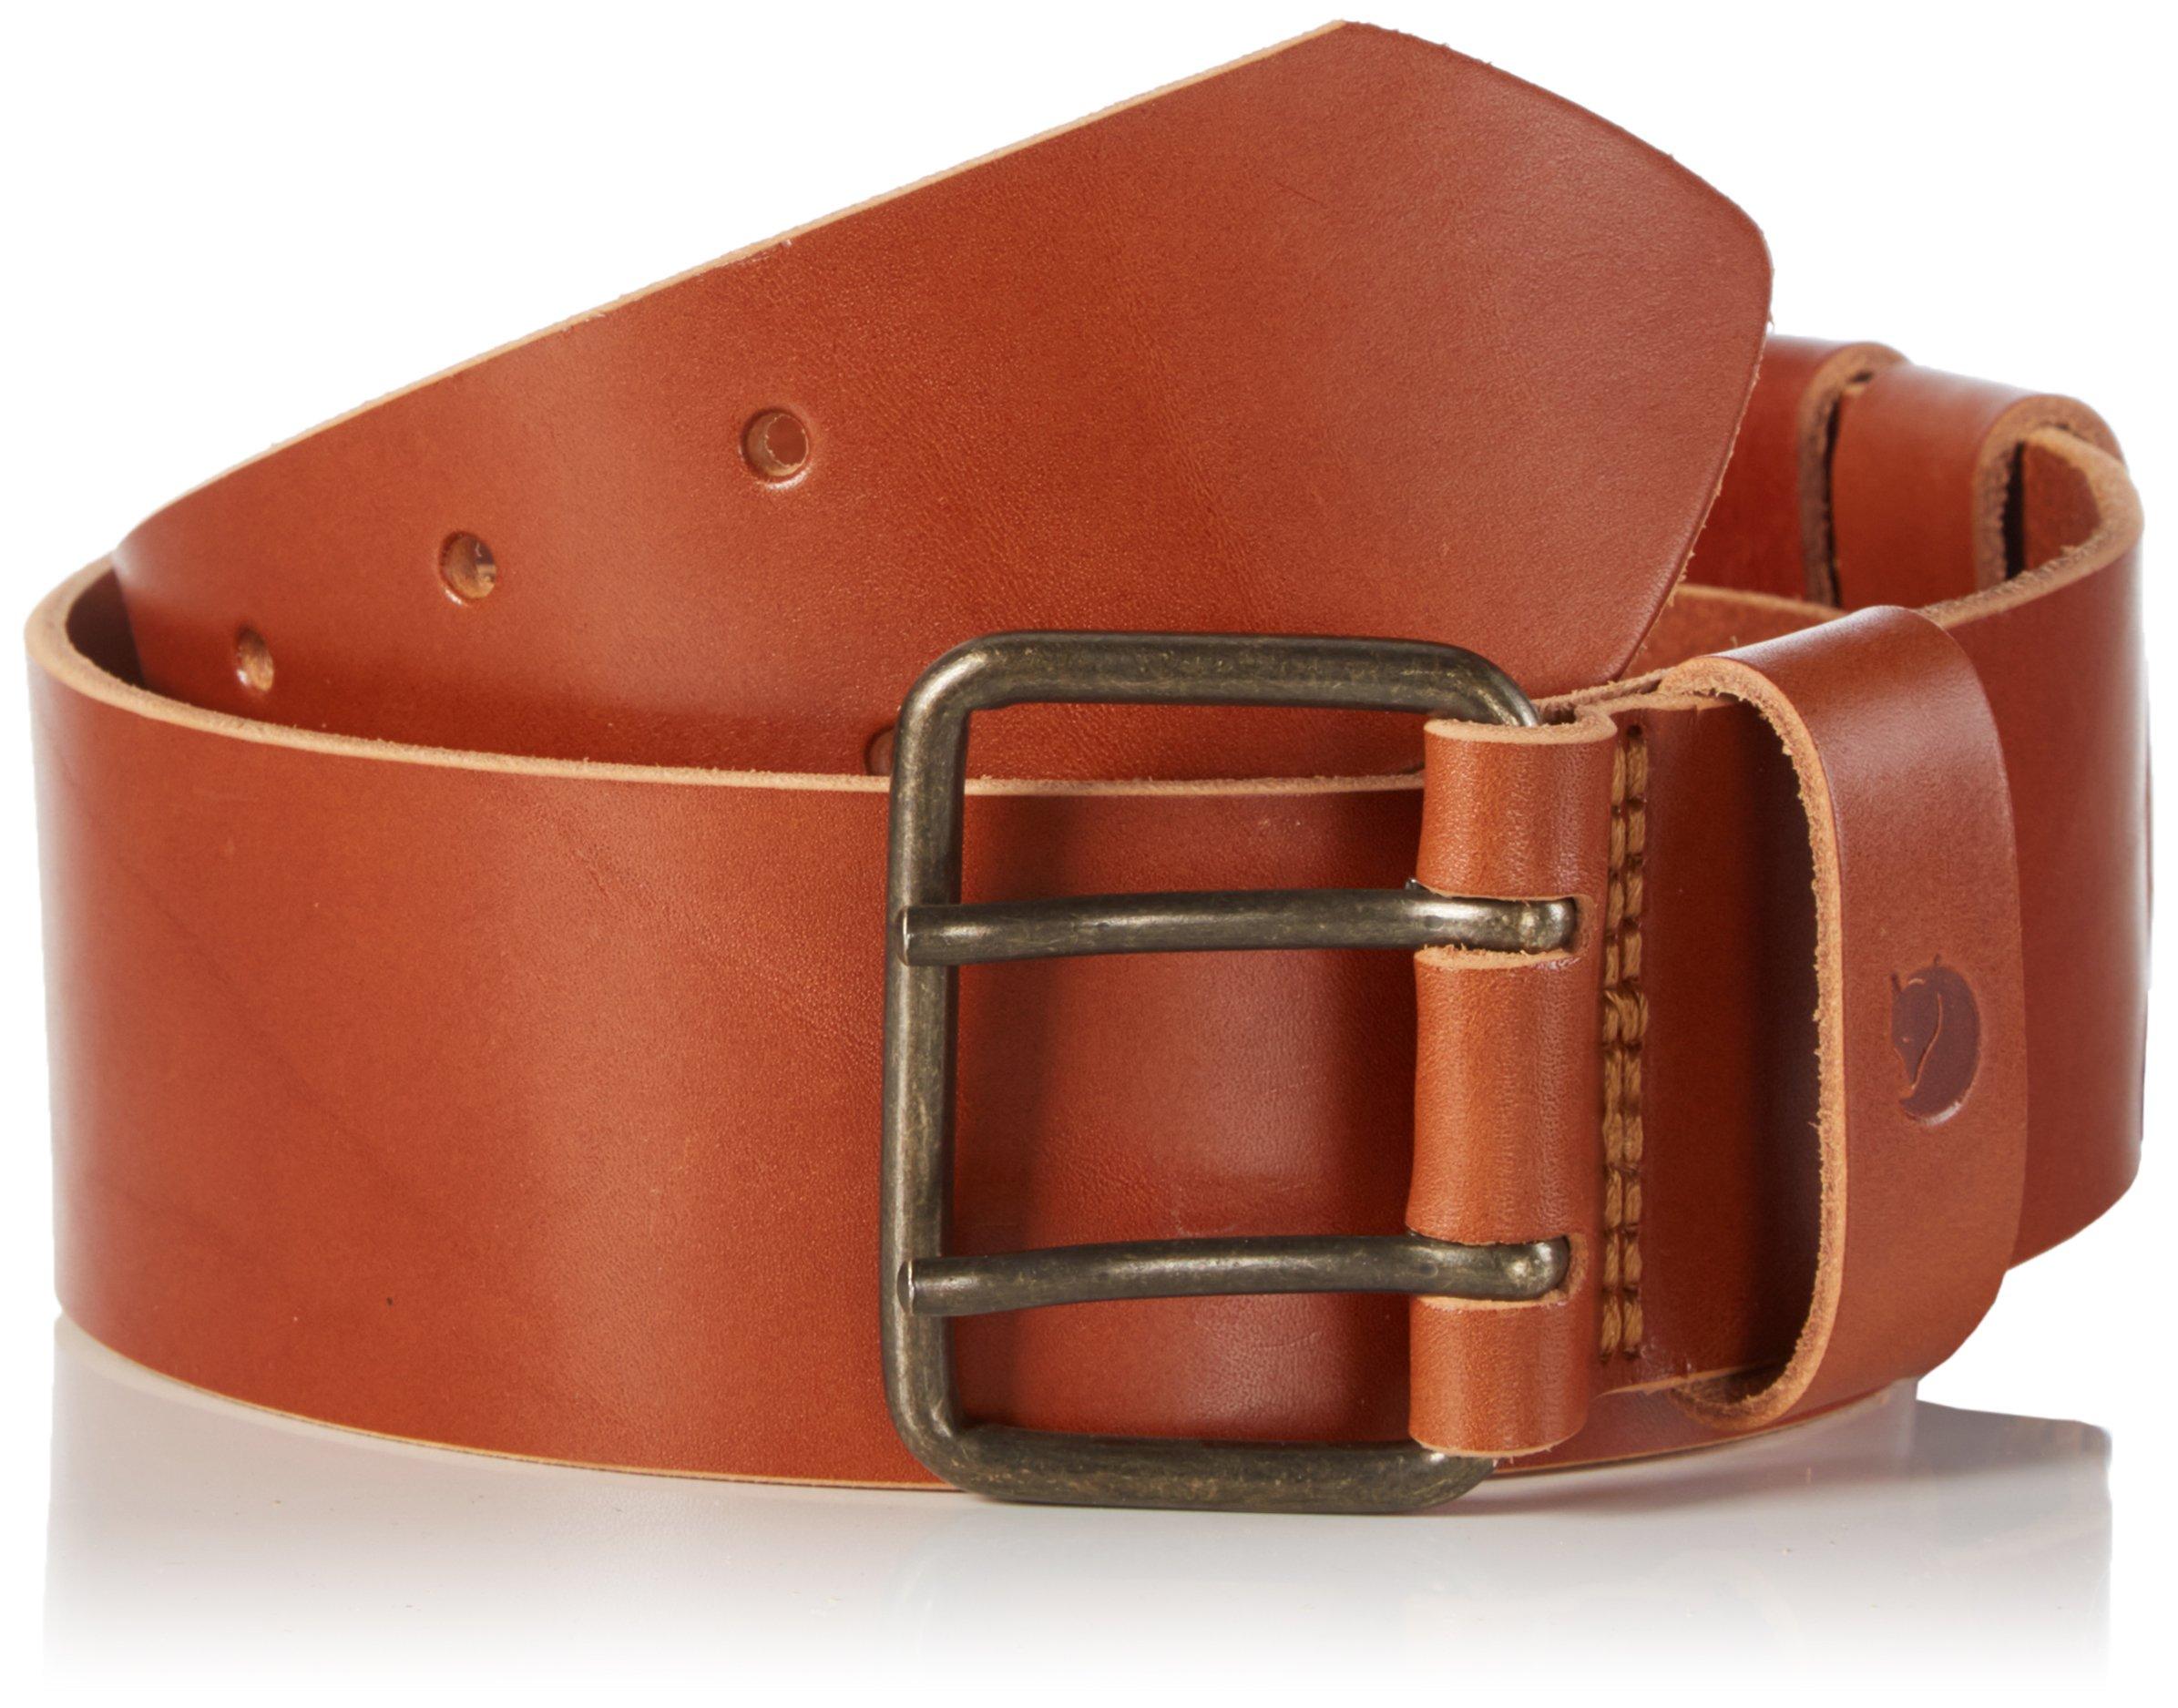 Fjallraven F77342 Equipment Belt, Leather Cognac - 85cm